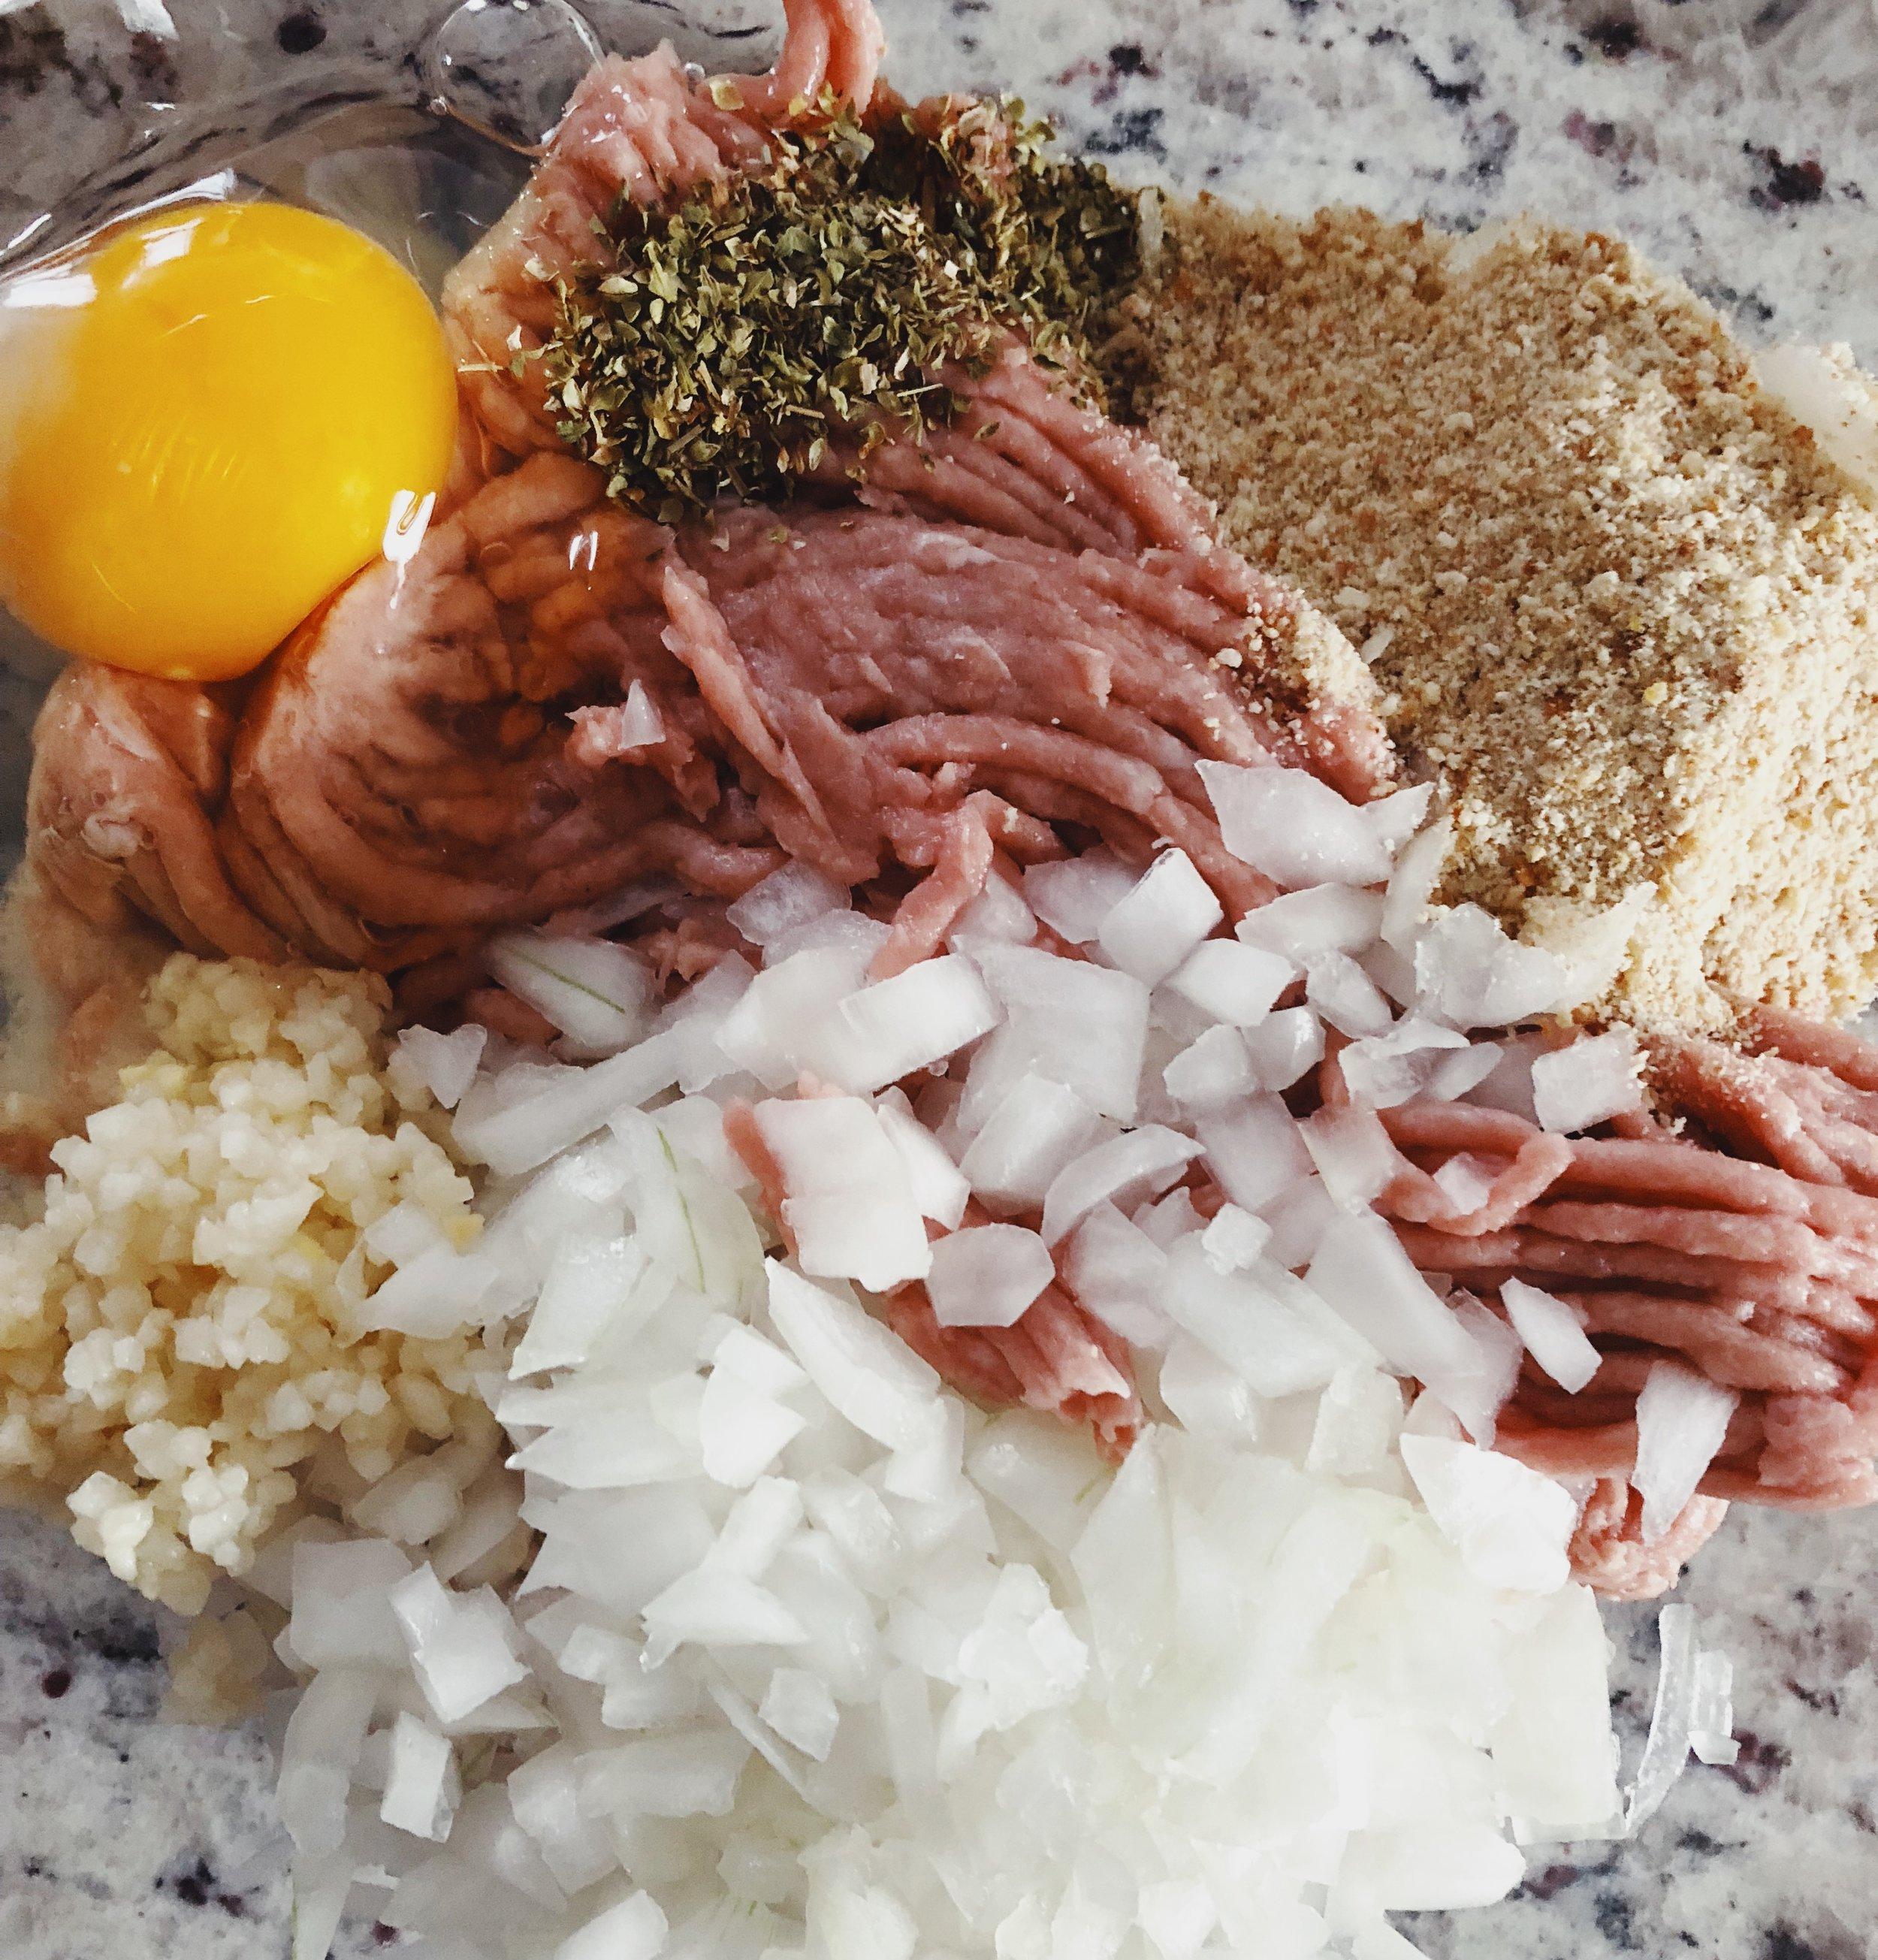 homemade turkey meatball ingredients